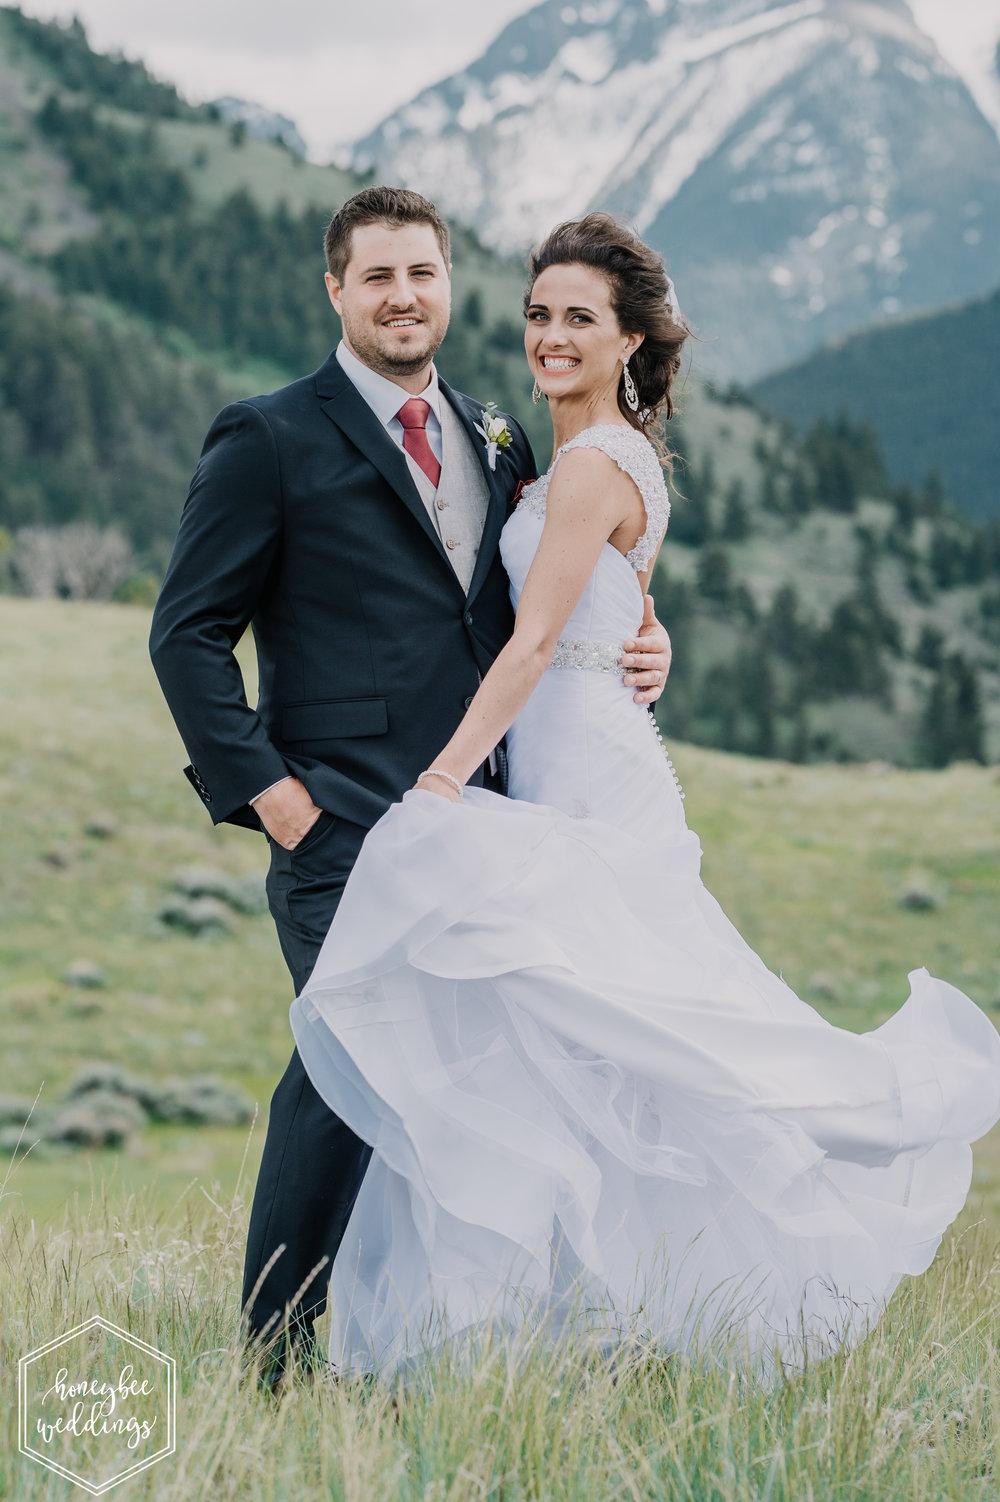 92 Chico Hotsprings Wedding_Bowdino 2018-3221.jpg